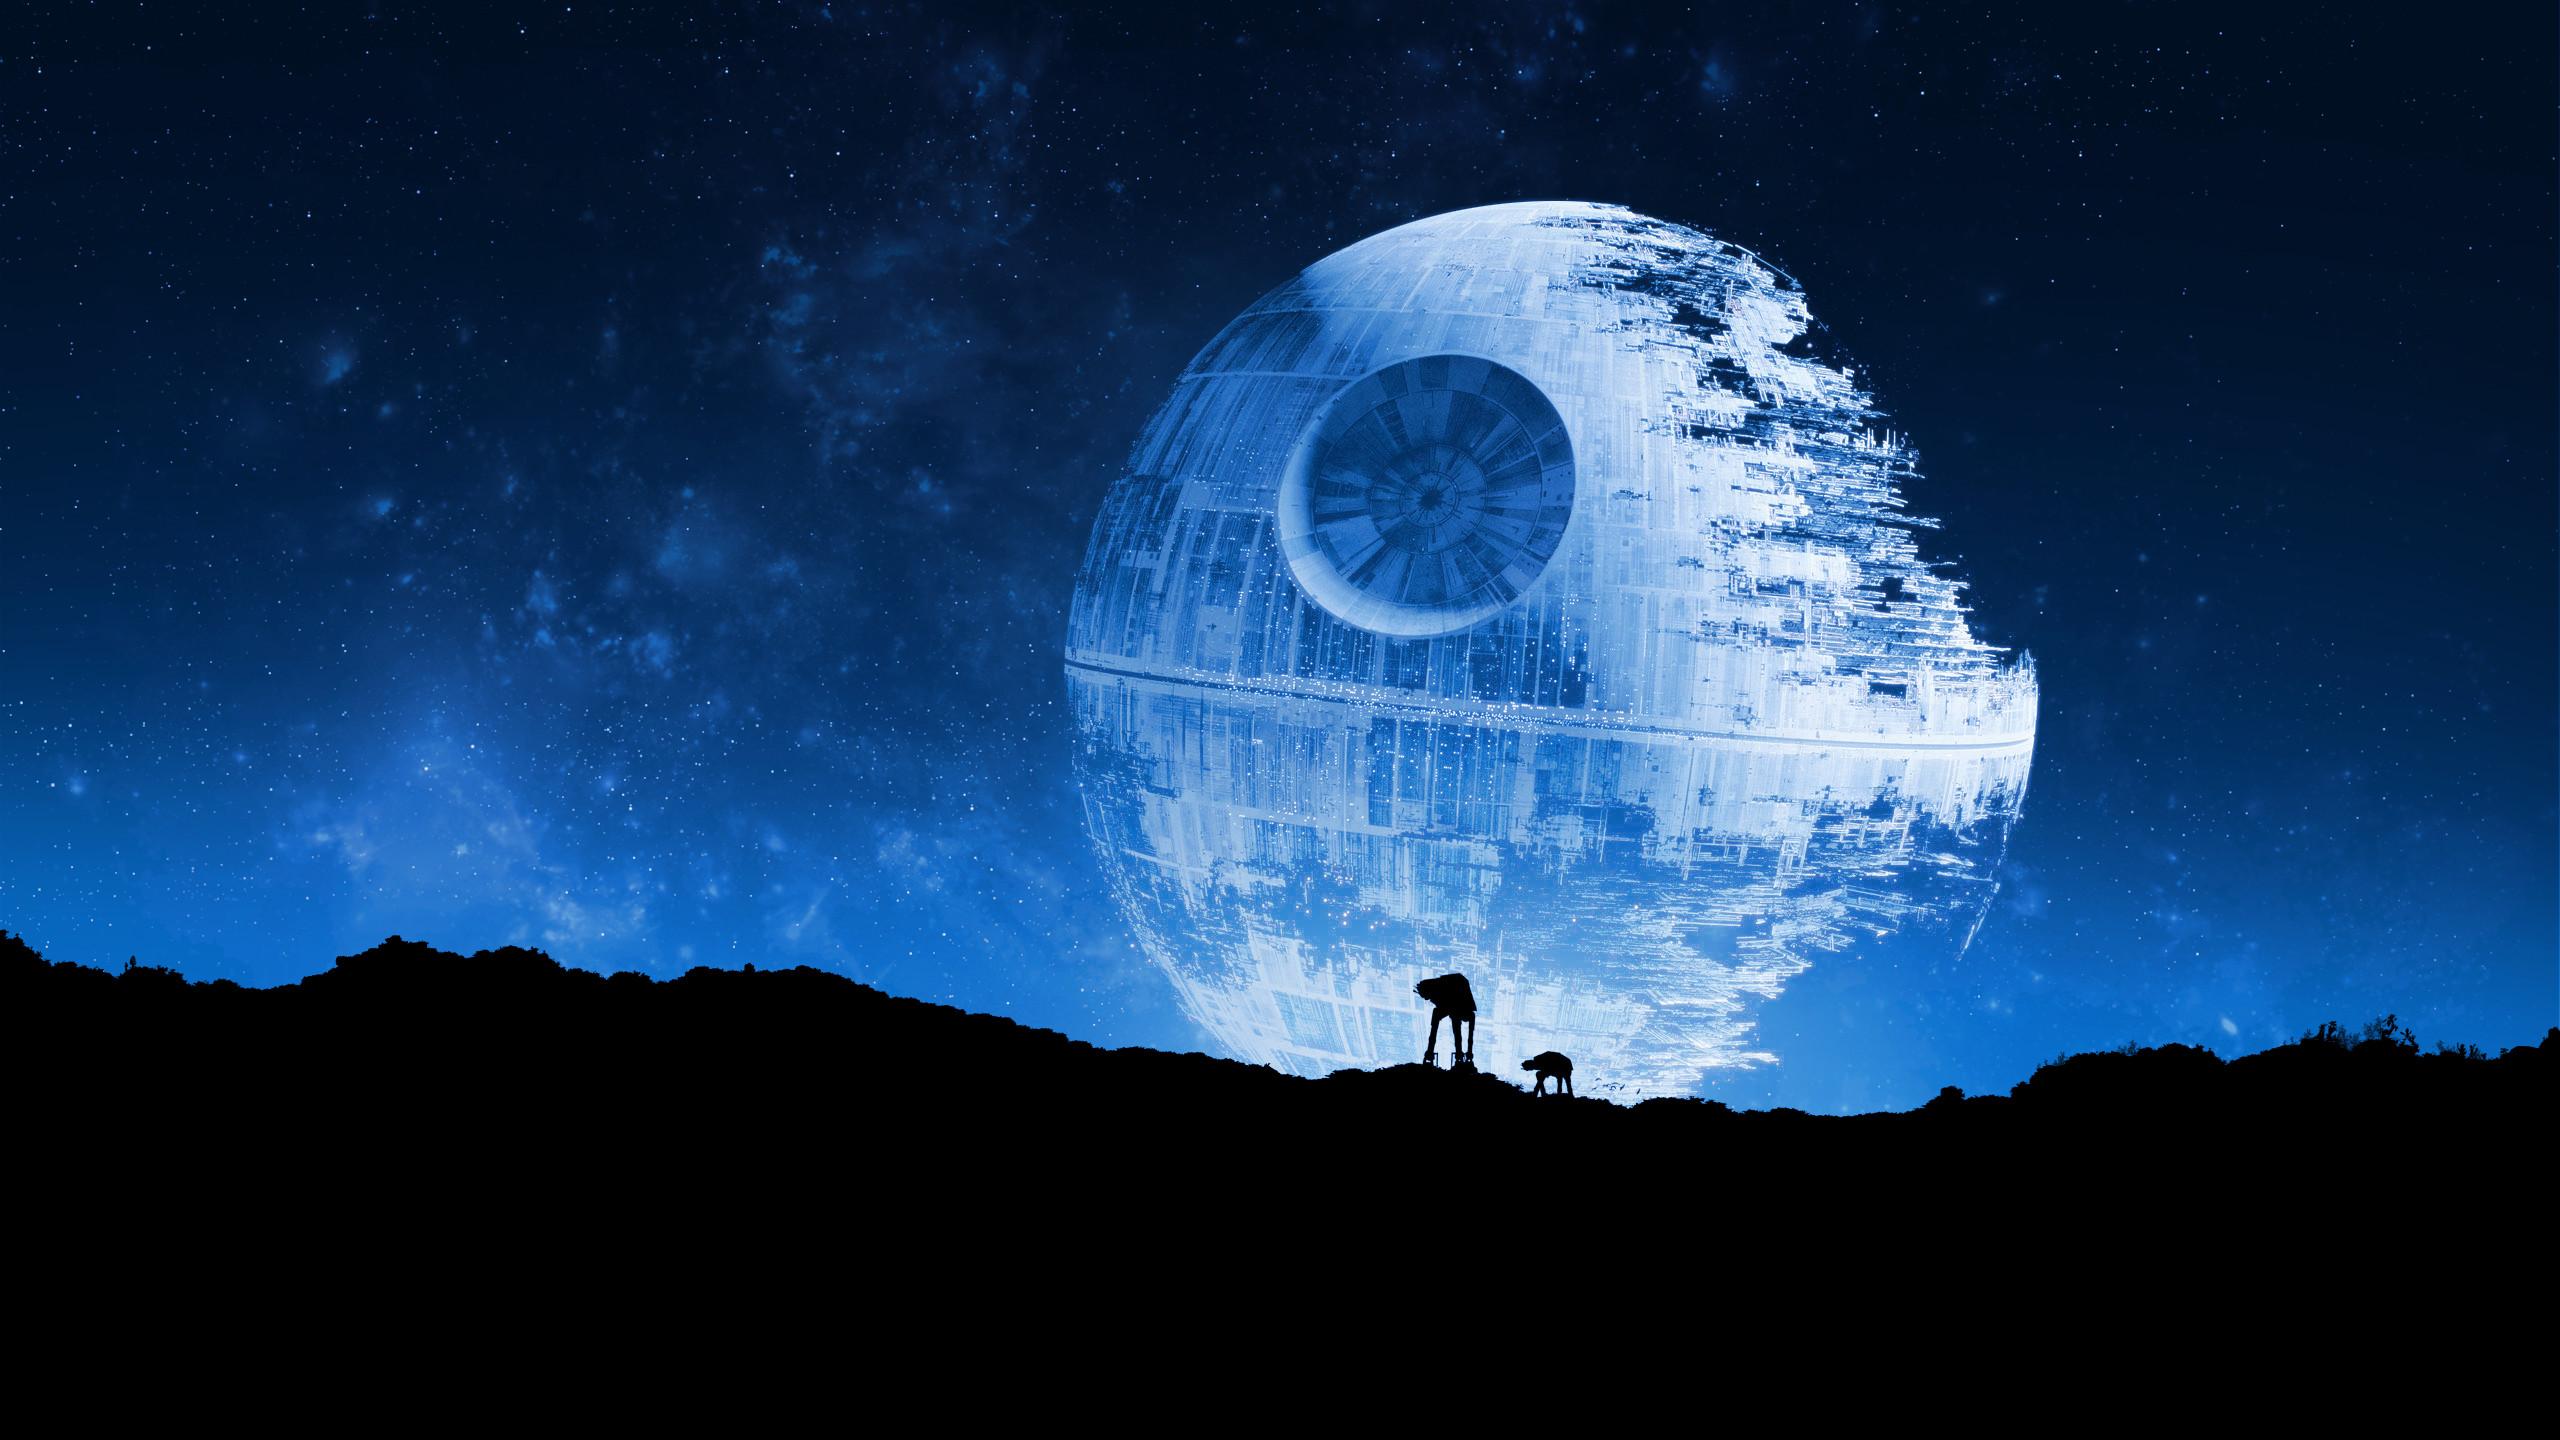 Star Wars – Death Star [2560×1440] …